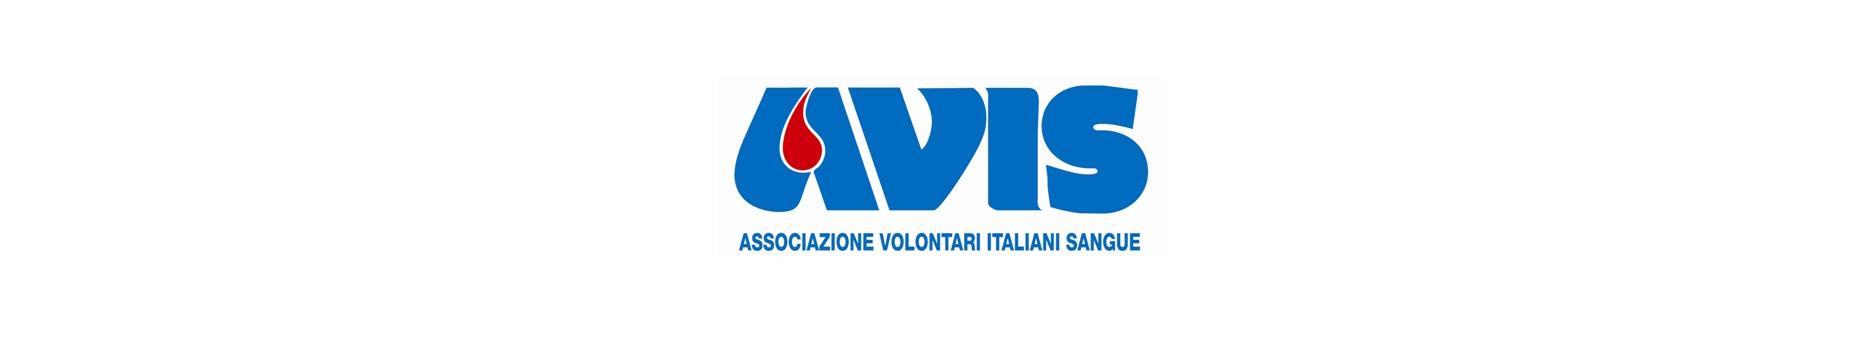 A.V.I.S. - Associazione Volontari Italiani del Sangue - logo